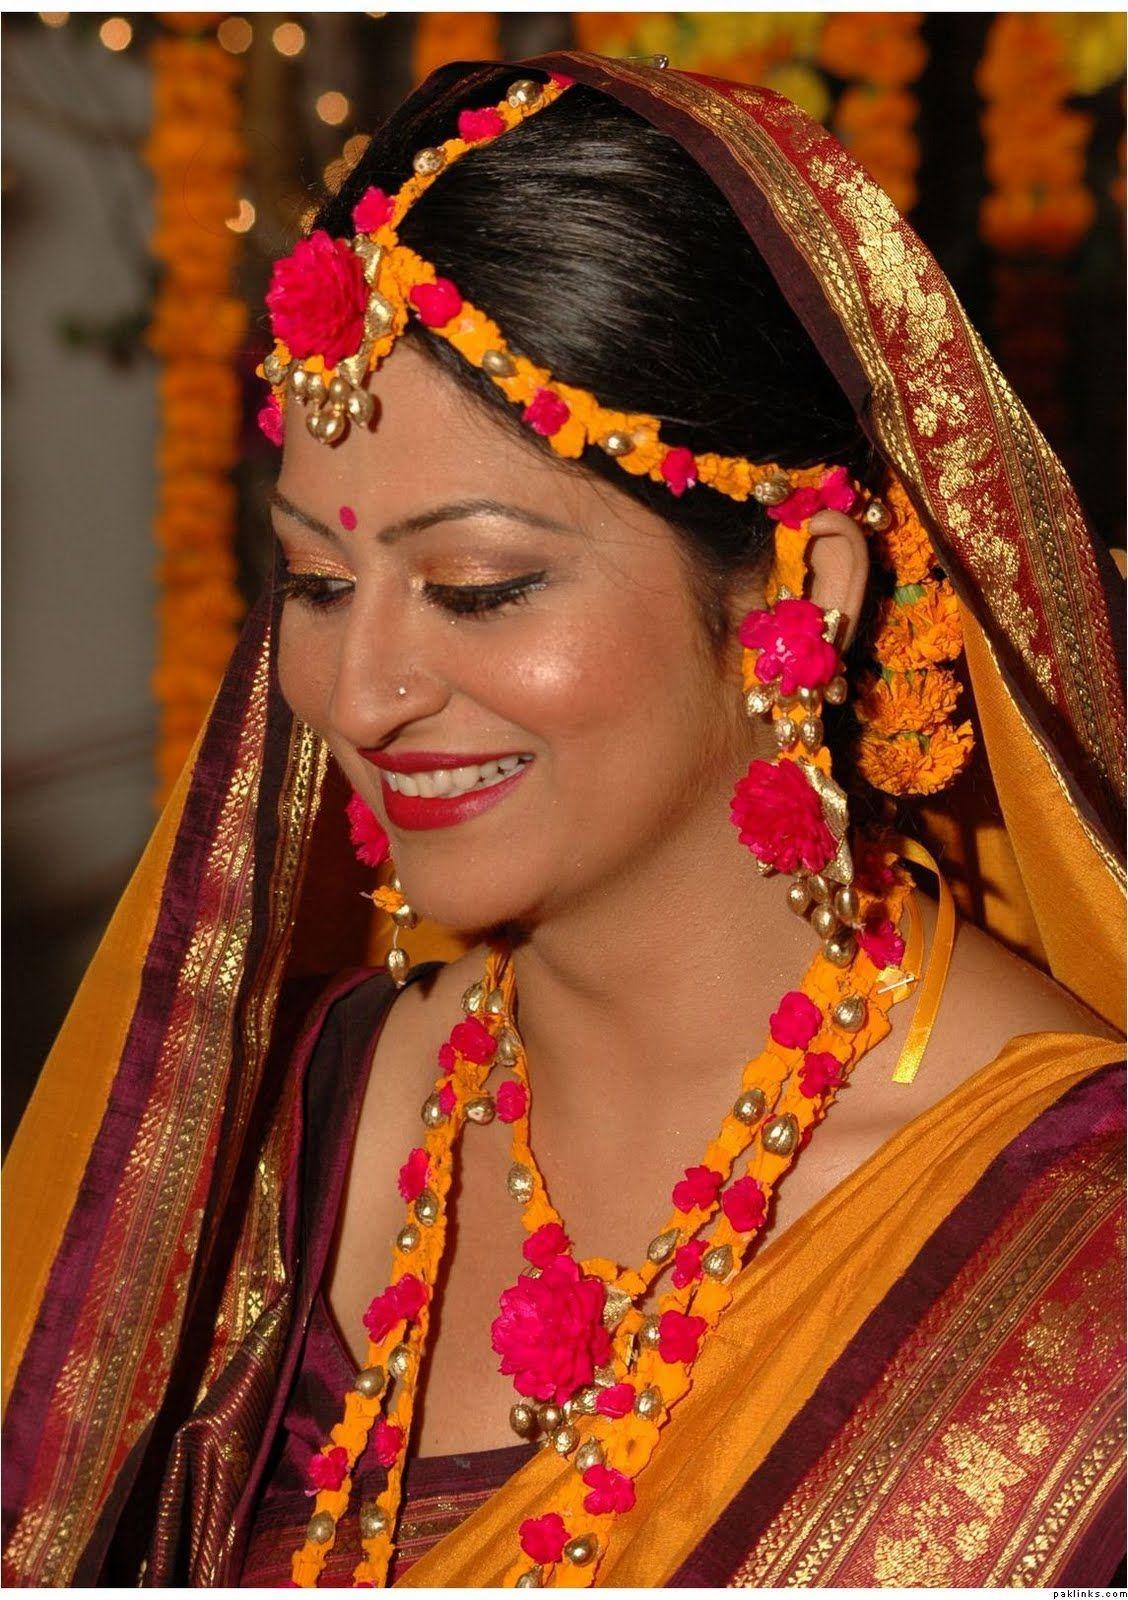 Kerala Style Carpenter Works And Designs September 2013: Bridal Hairstyle In Bangladesh